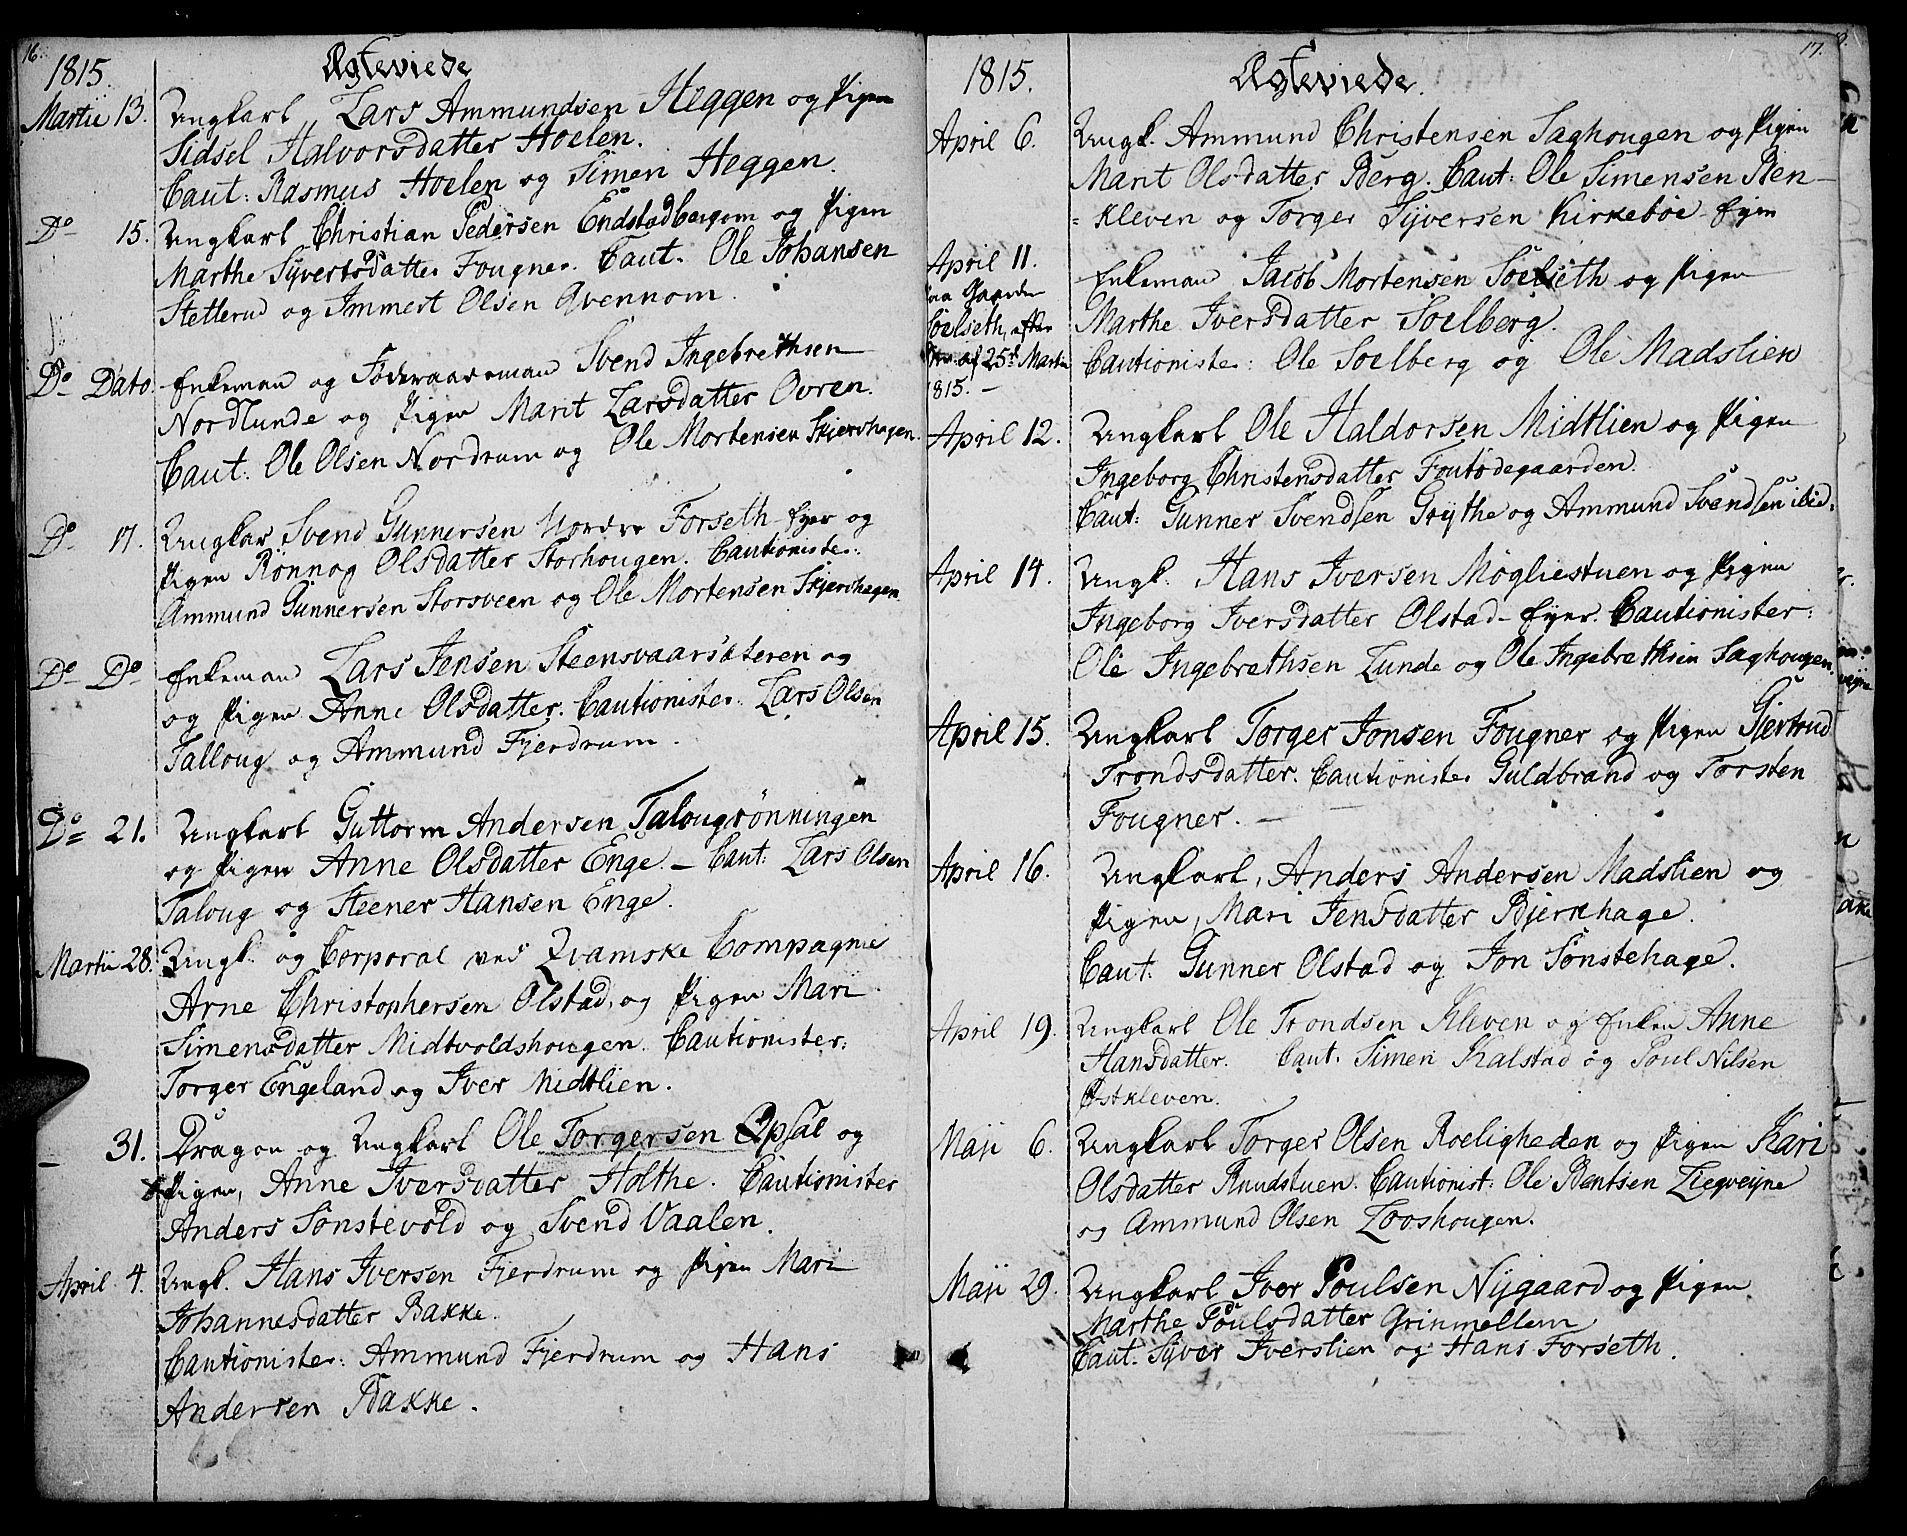 SAH, Gausdal prestekontor, Ministerialbok nr. 4, 1809-1817, s. 16-17